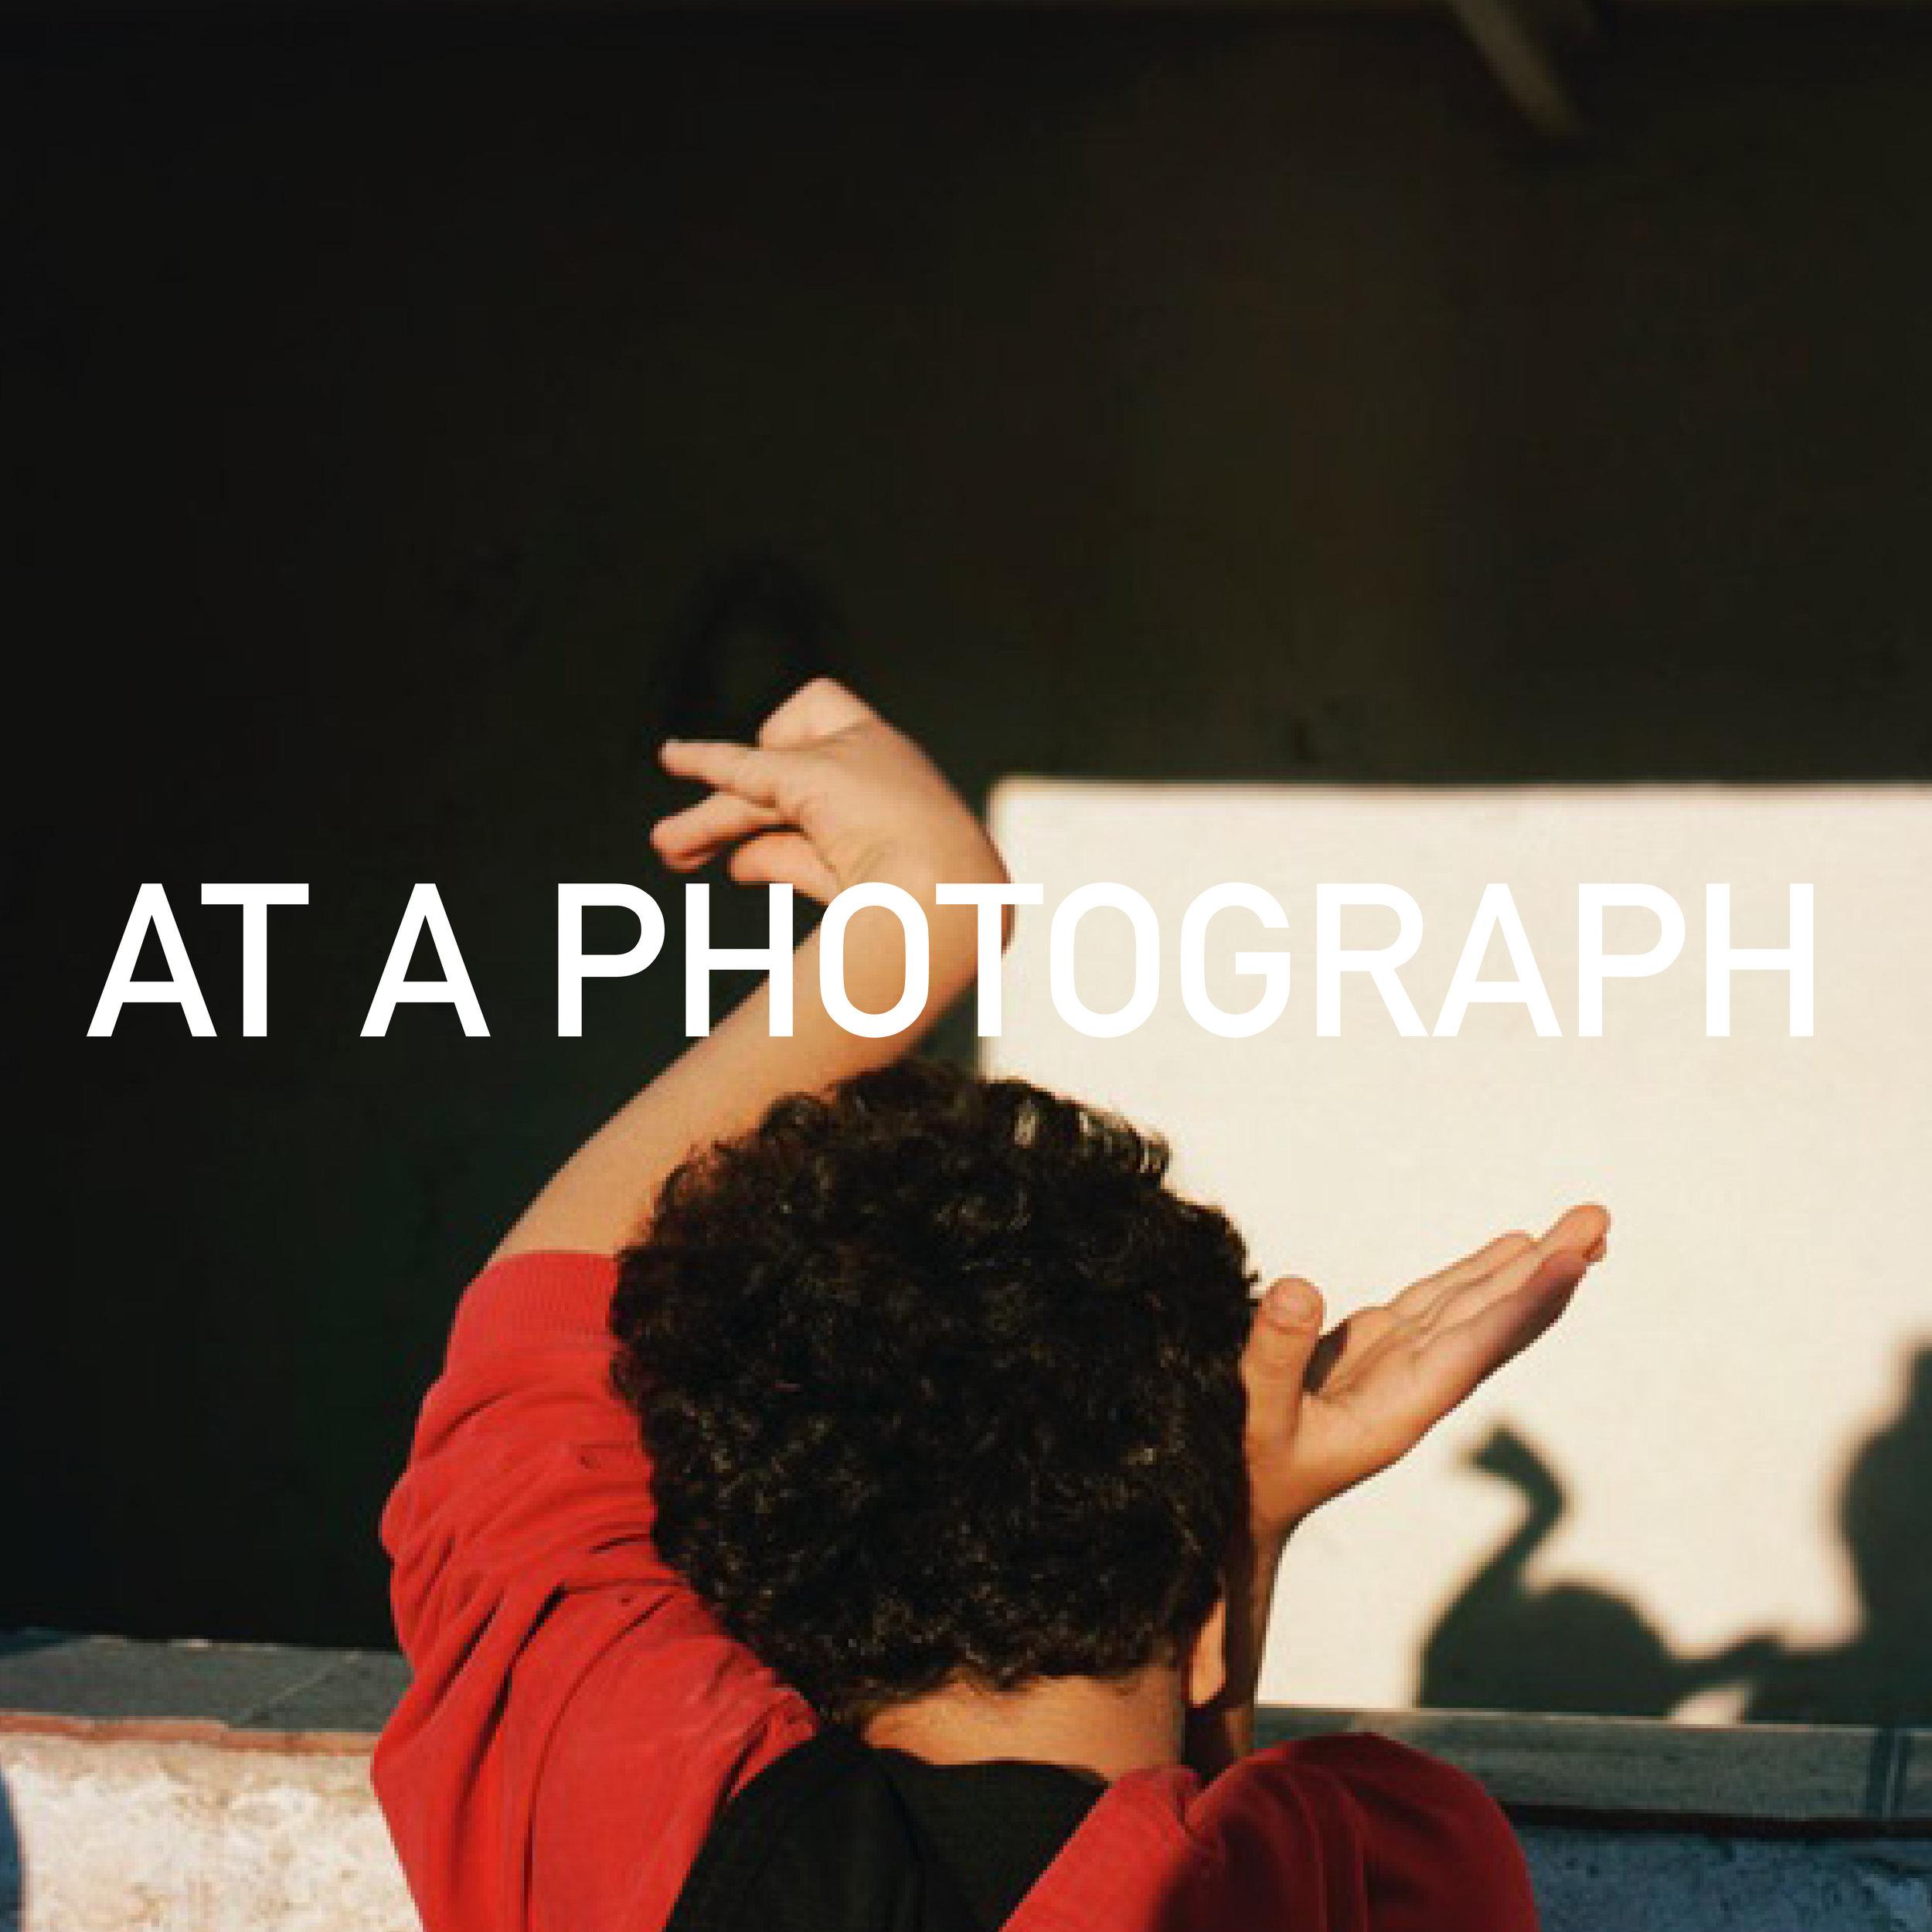 AT A PHOTOGRAPH 3.jpg